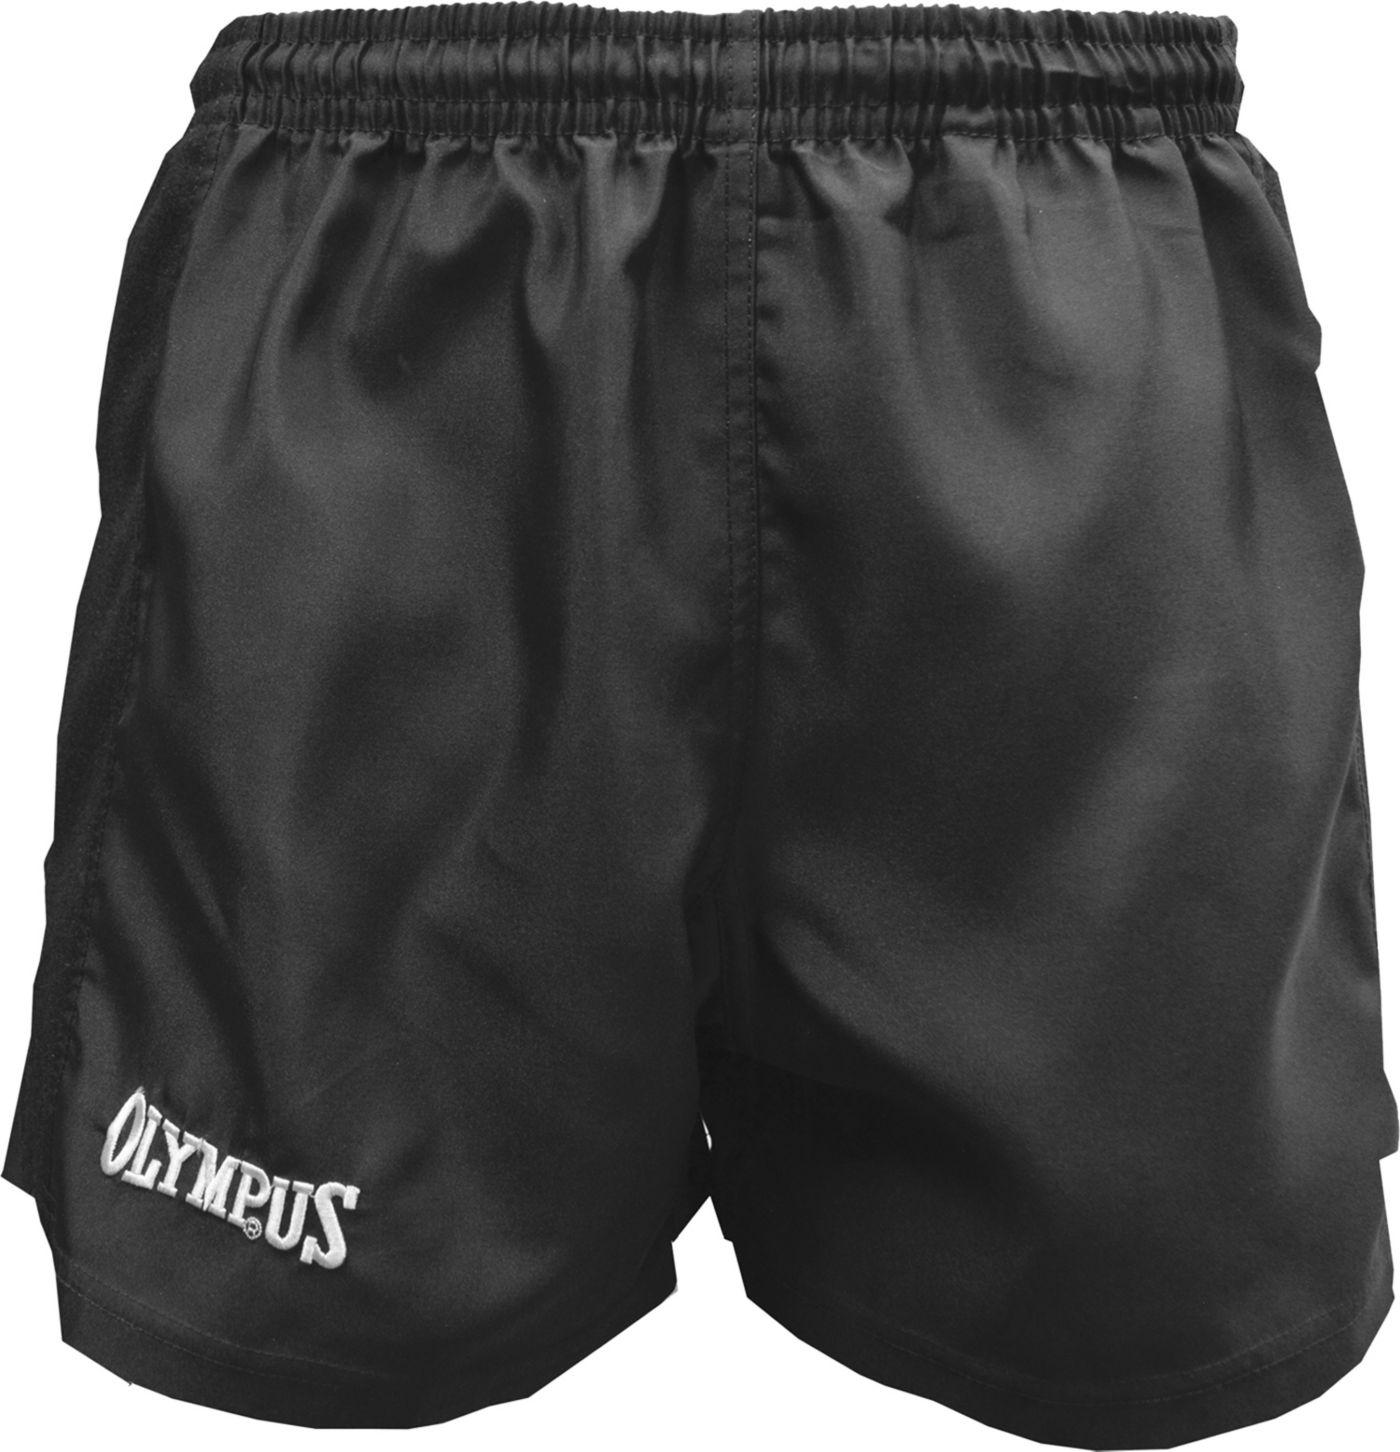 Olympus Adult Elite Rugby Shorts